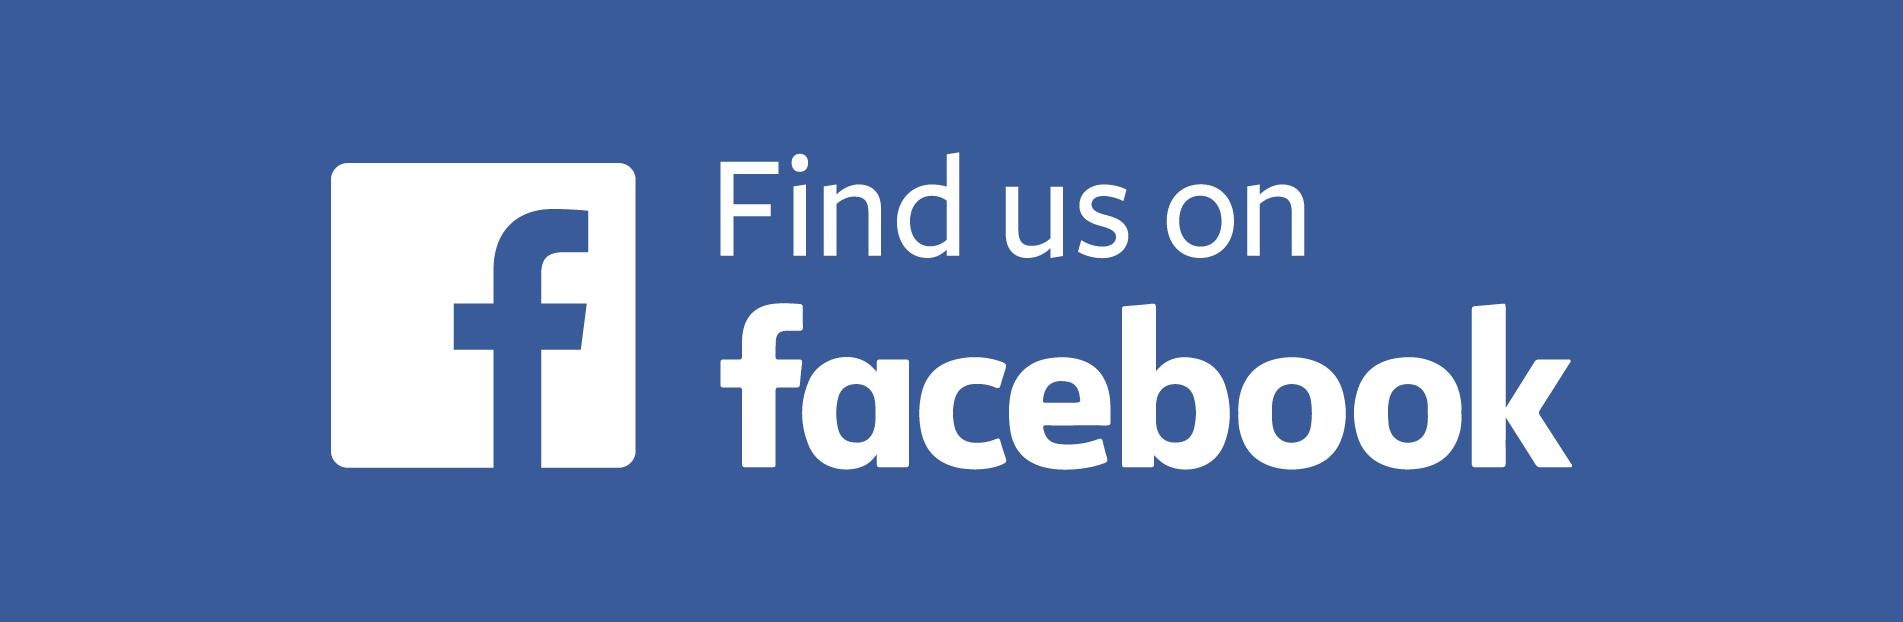 https://www.facebook.com/vistadentalproducts/?ref=aymt_homepage_panel